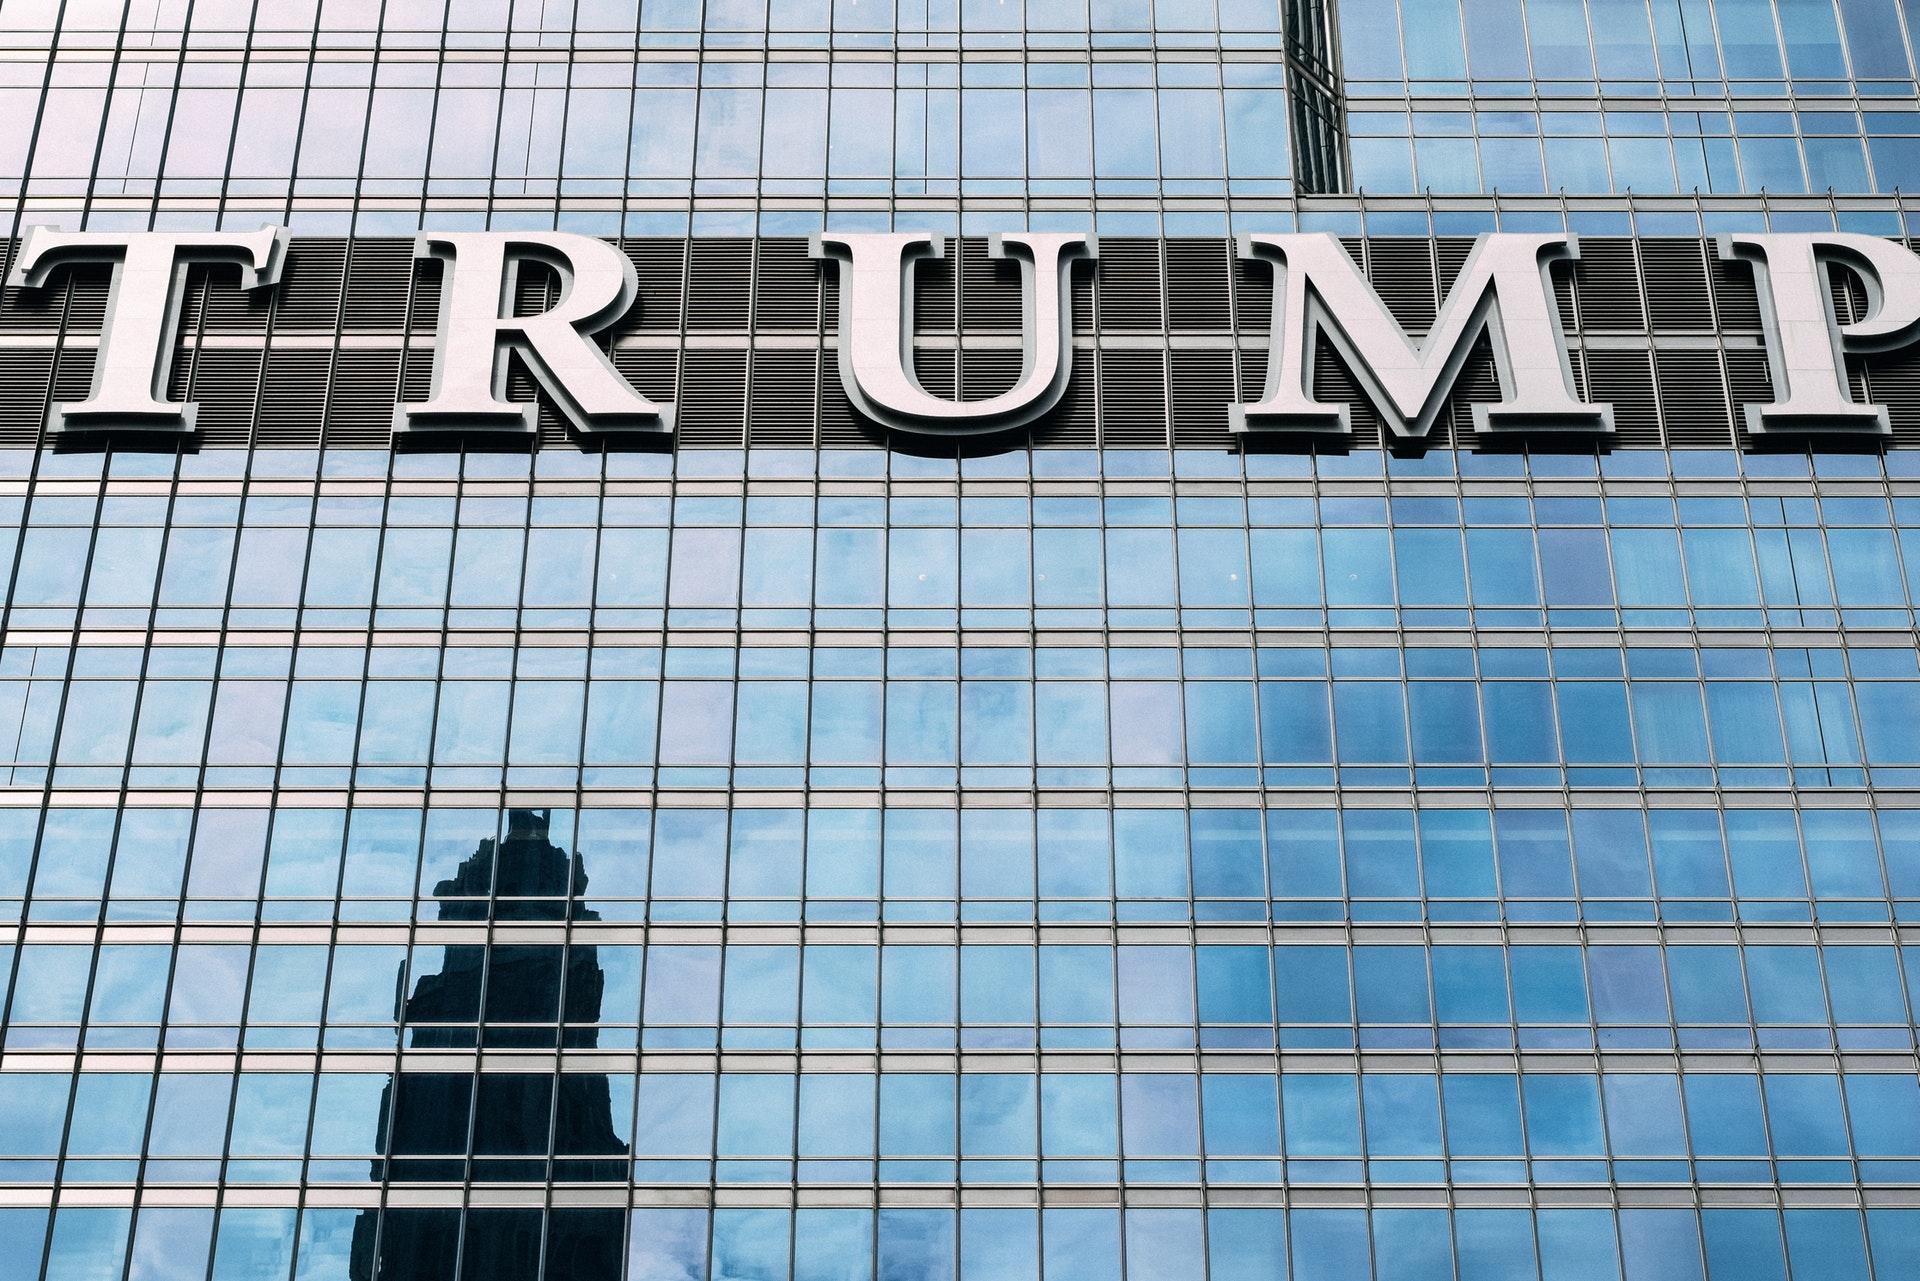 Did Trump's tweets move the stock market? - Stockgeist